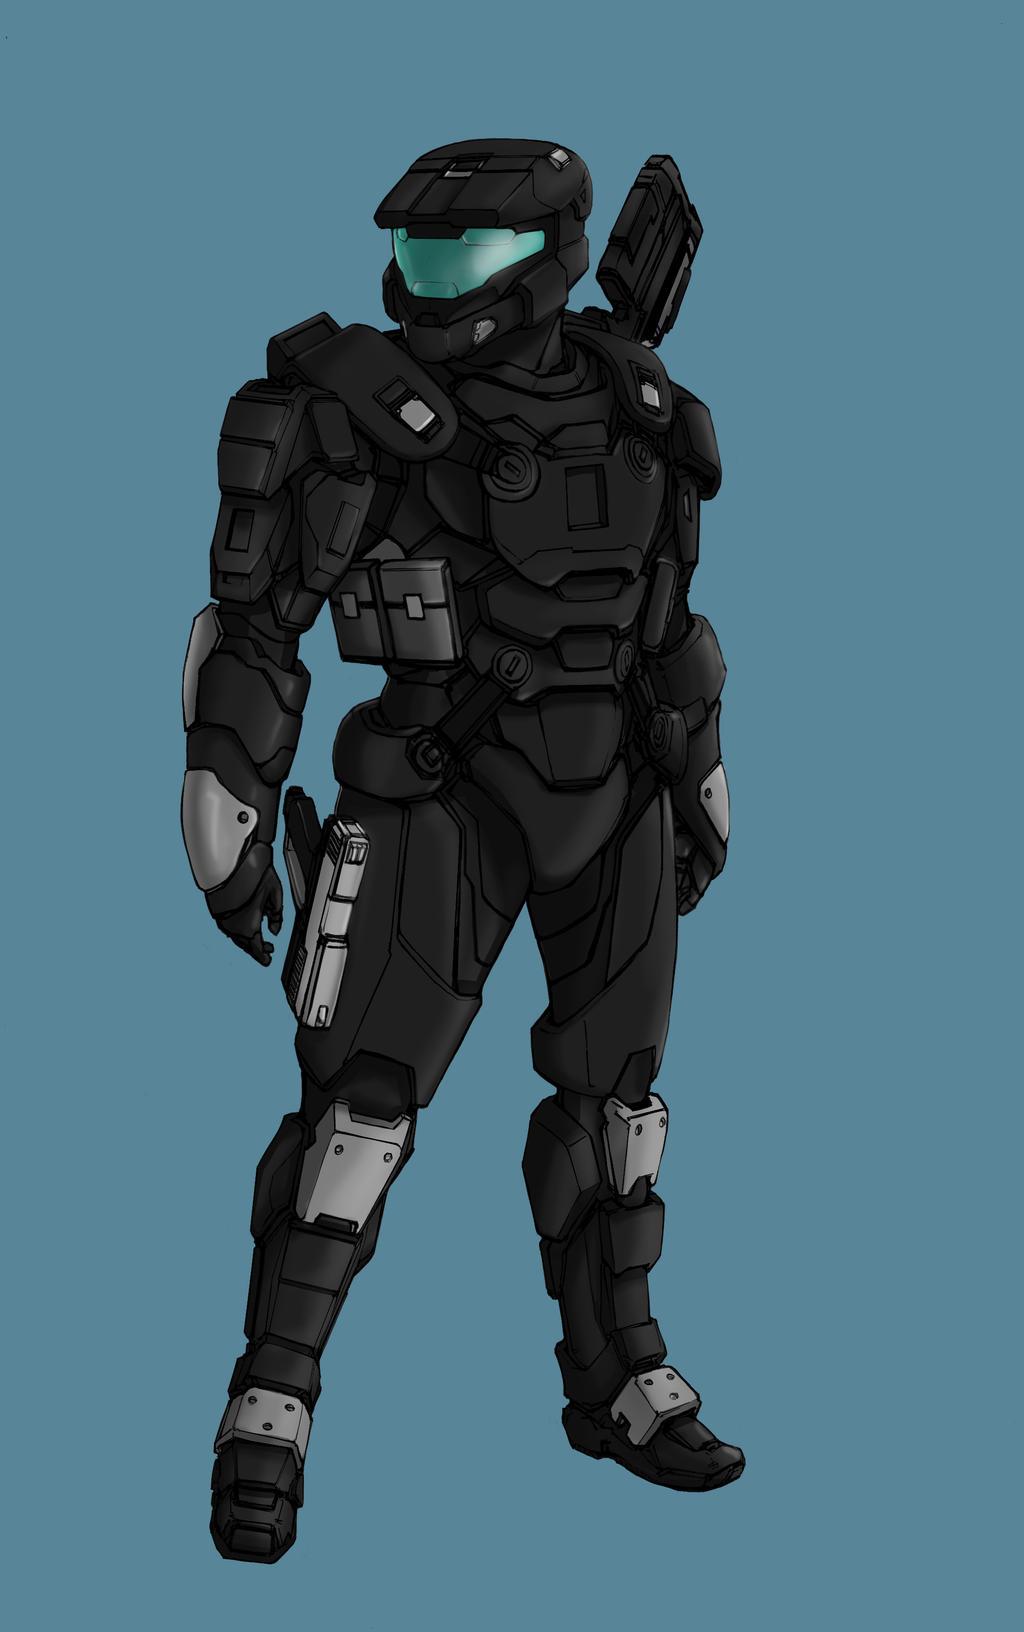 Spartan Spi Commission By Thomchen114 On Deviantart